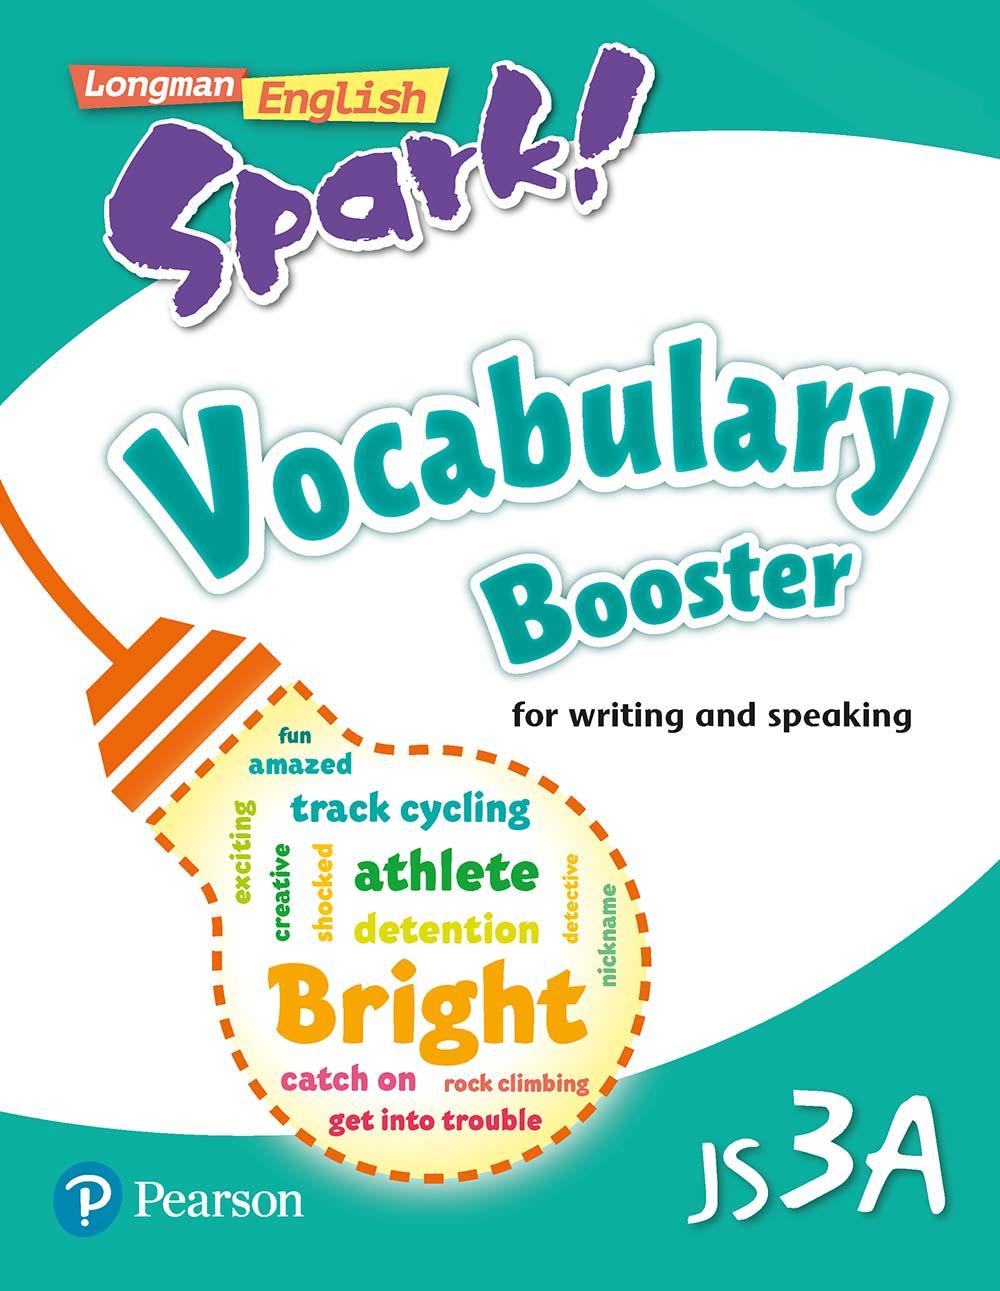 Longman English Spark! JS3A Vocabulary Booster